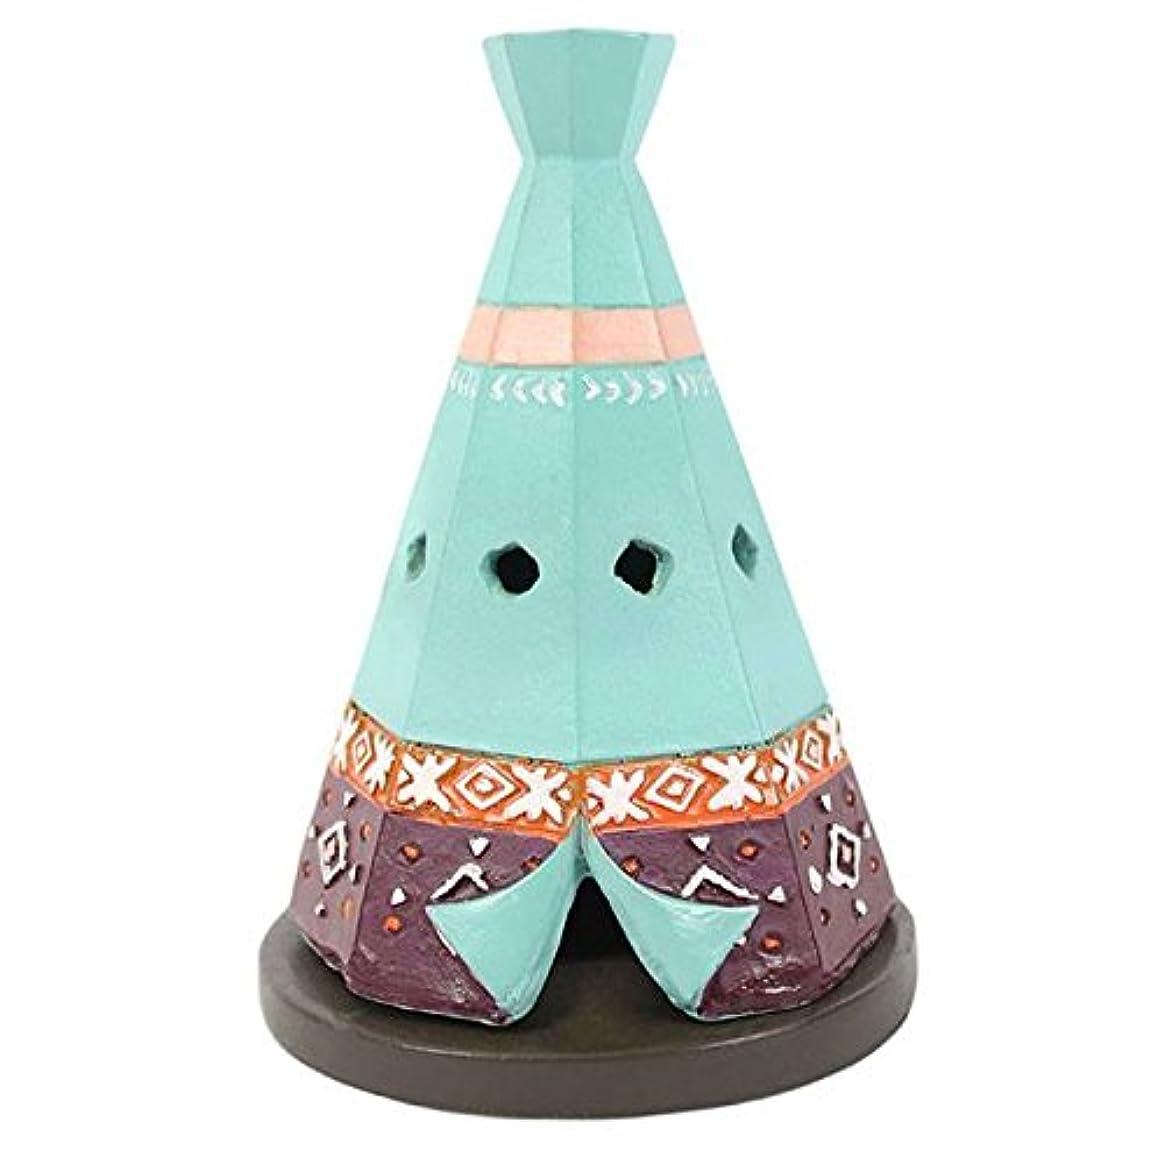 心臓労苦想像力Teepee / Wigwam Design Incense Cone Holder